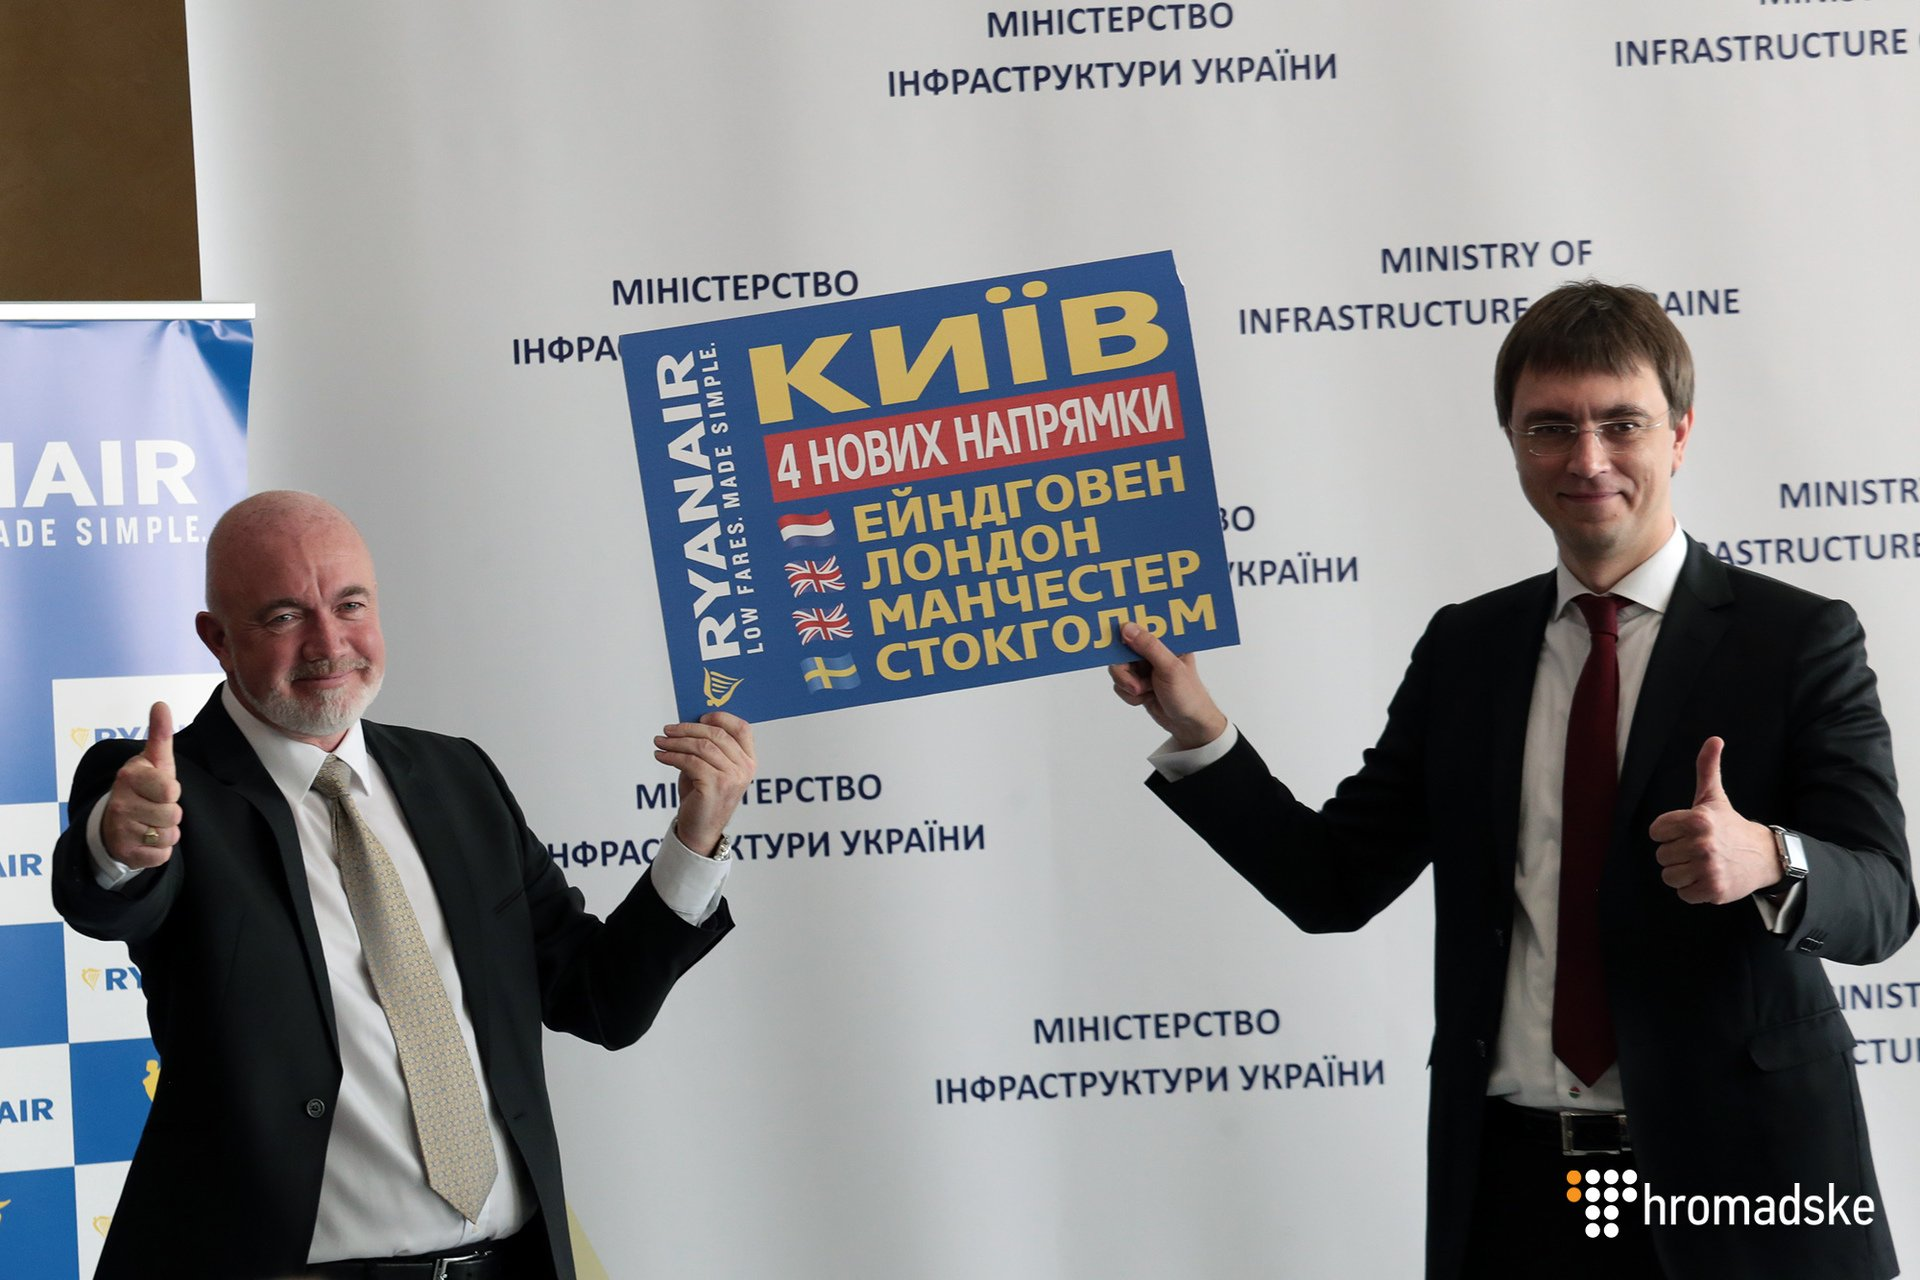 Дэвид О'Брайан и Владимир Омелян